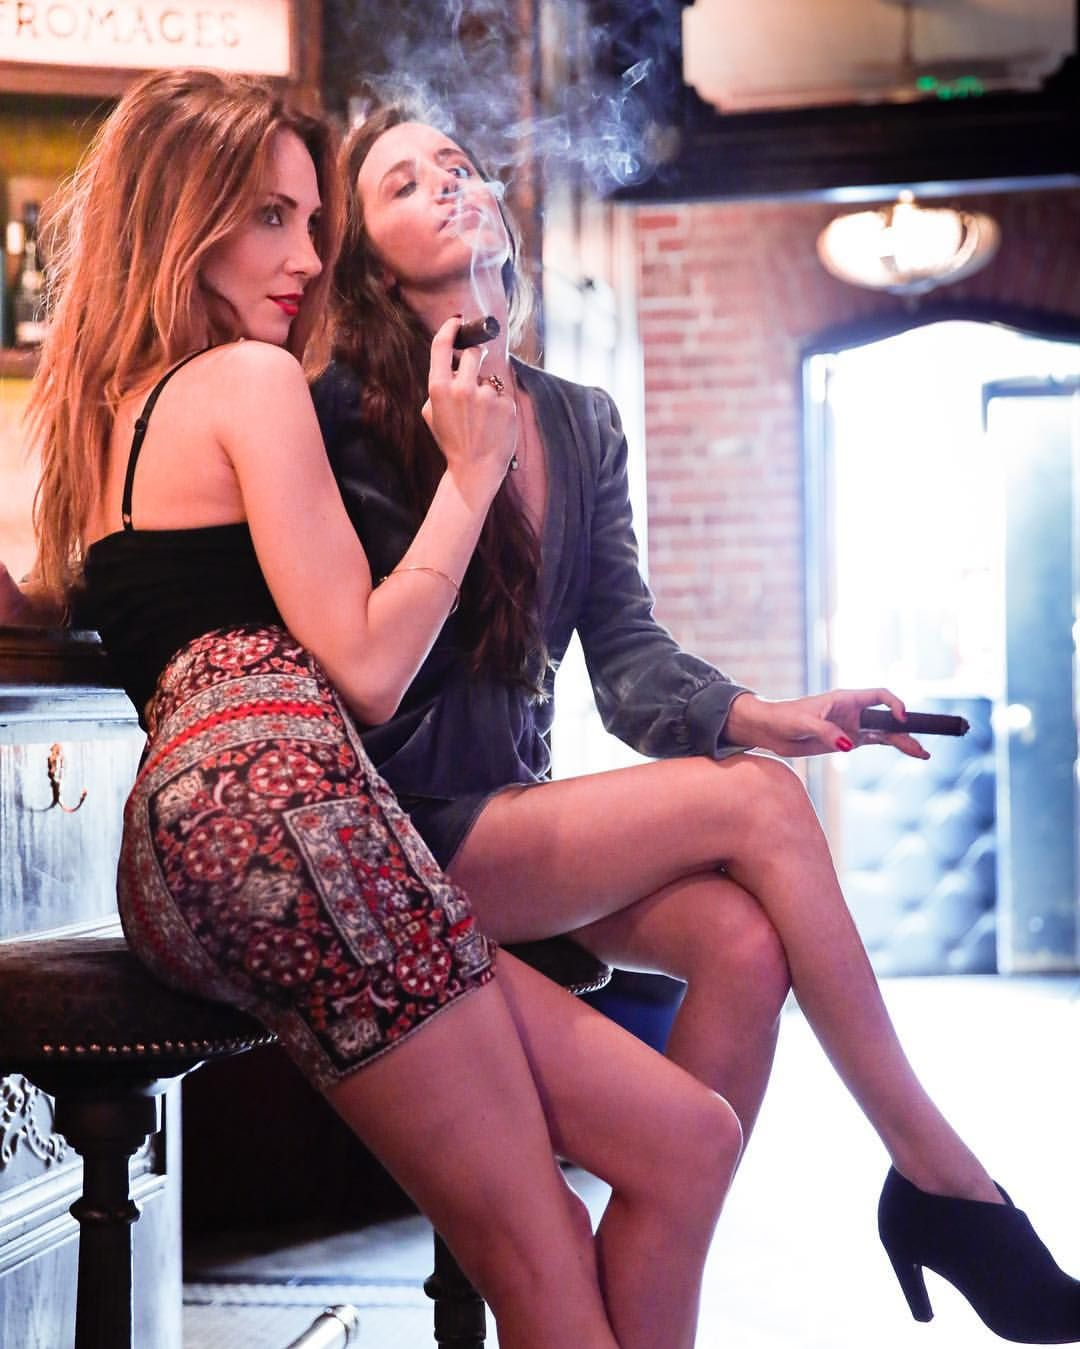 my_cigar_ladies_cigar_influencers_cigar_instagrammers.jpg